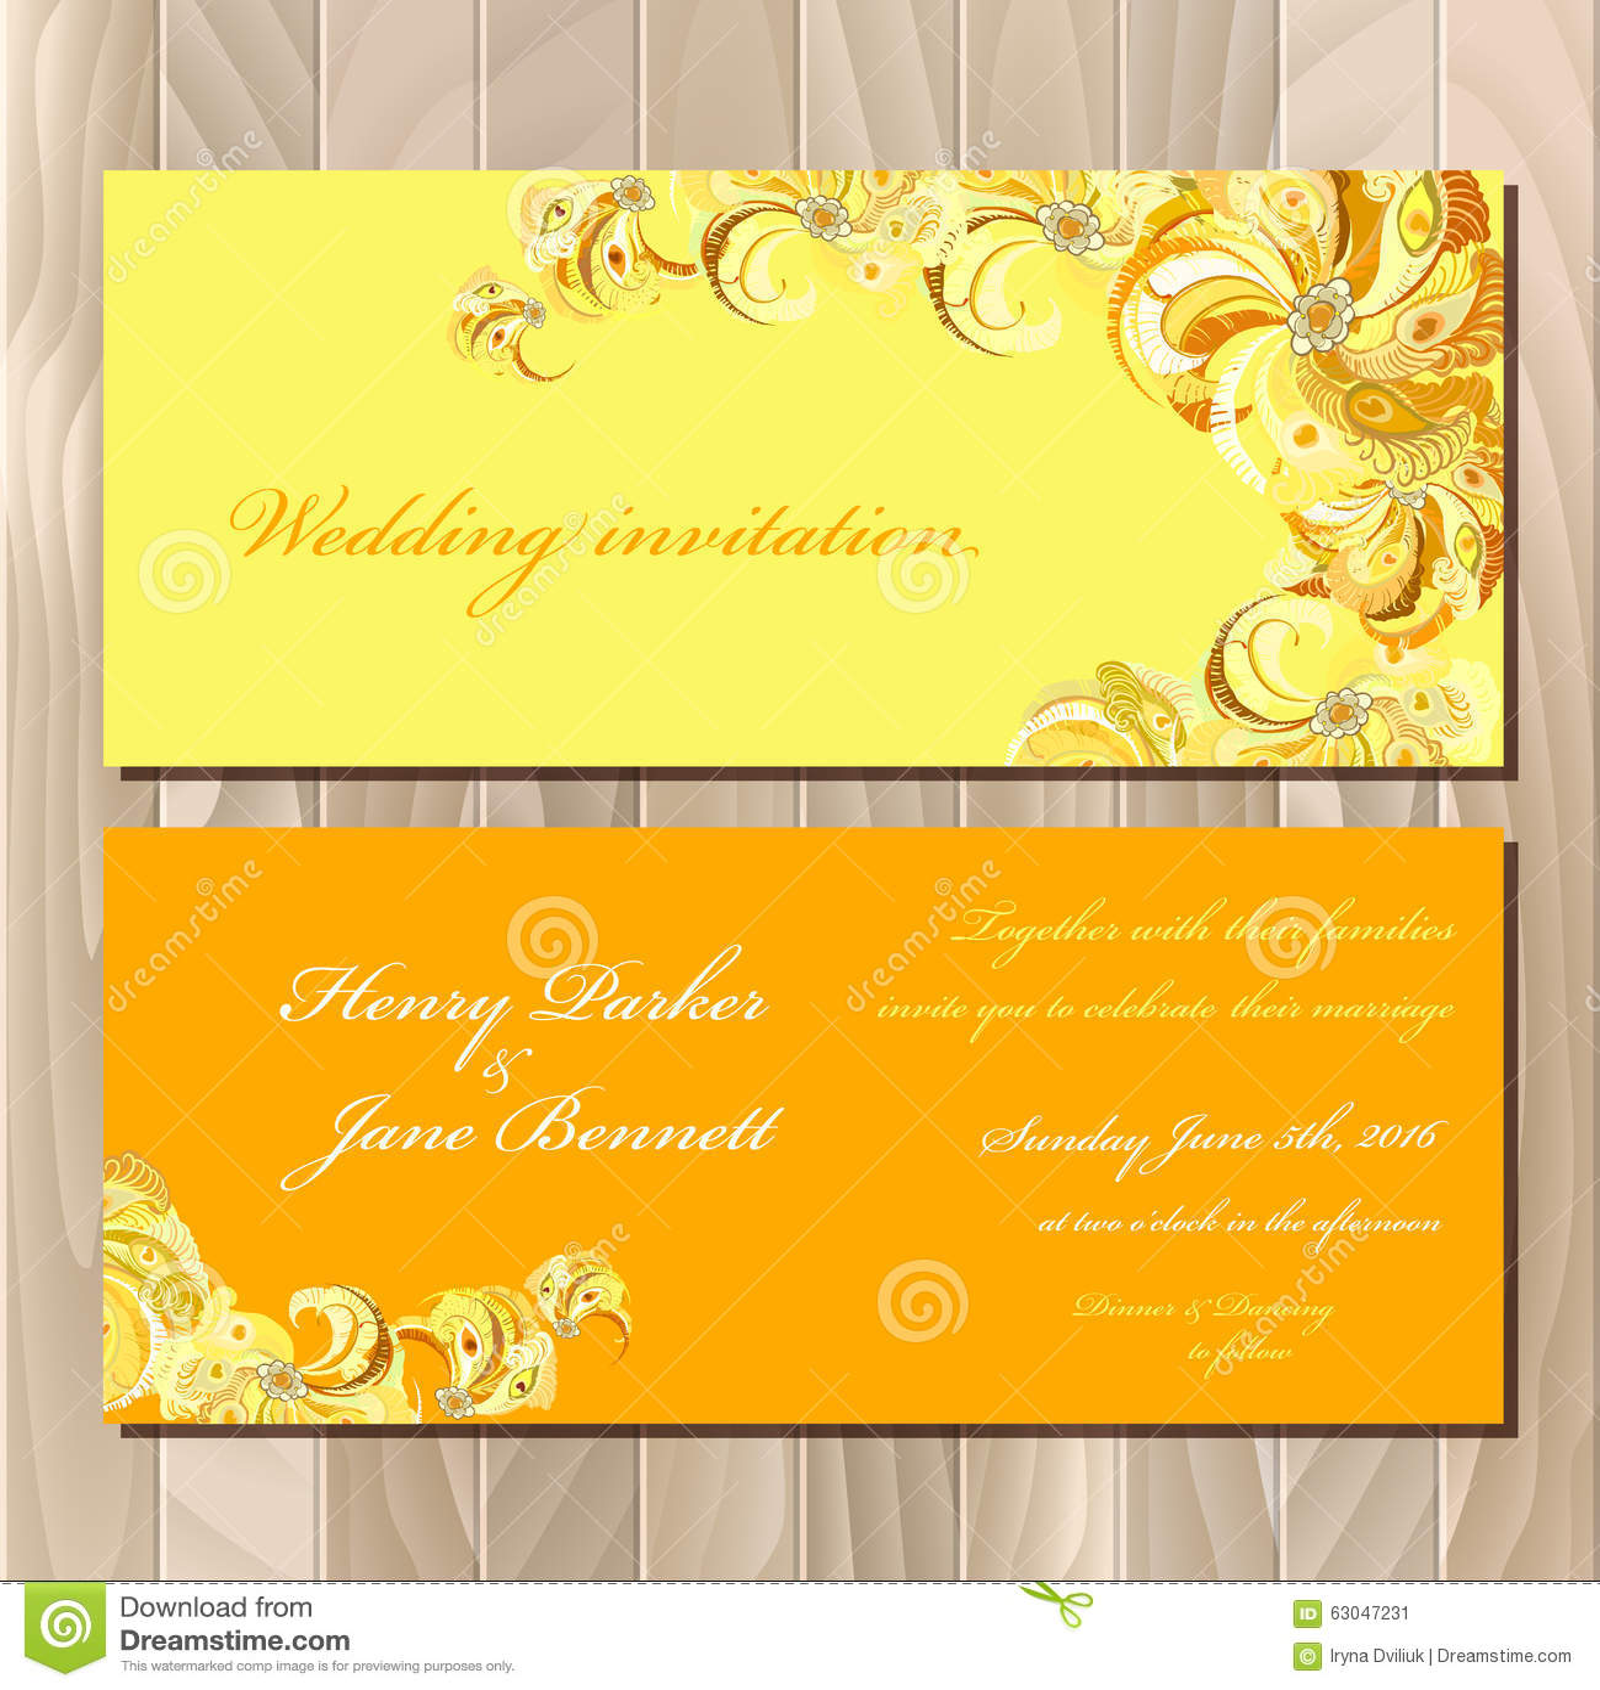 Traditional Wedding Ceremony Timeline   wedding timeline ...